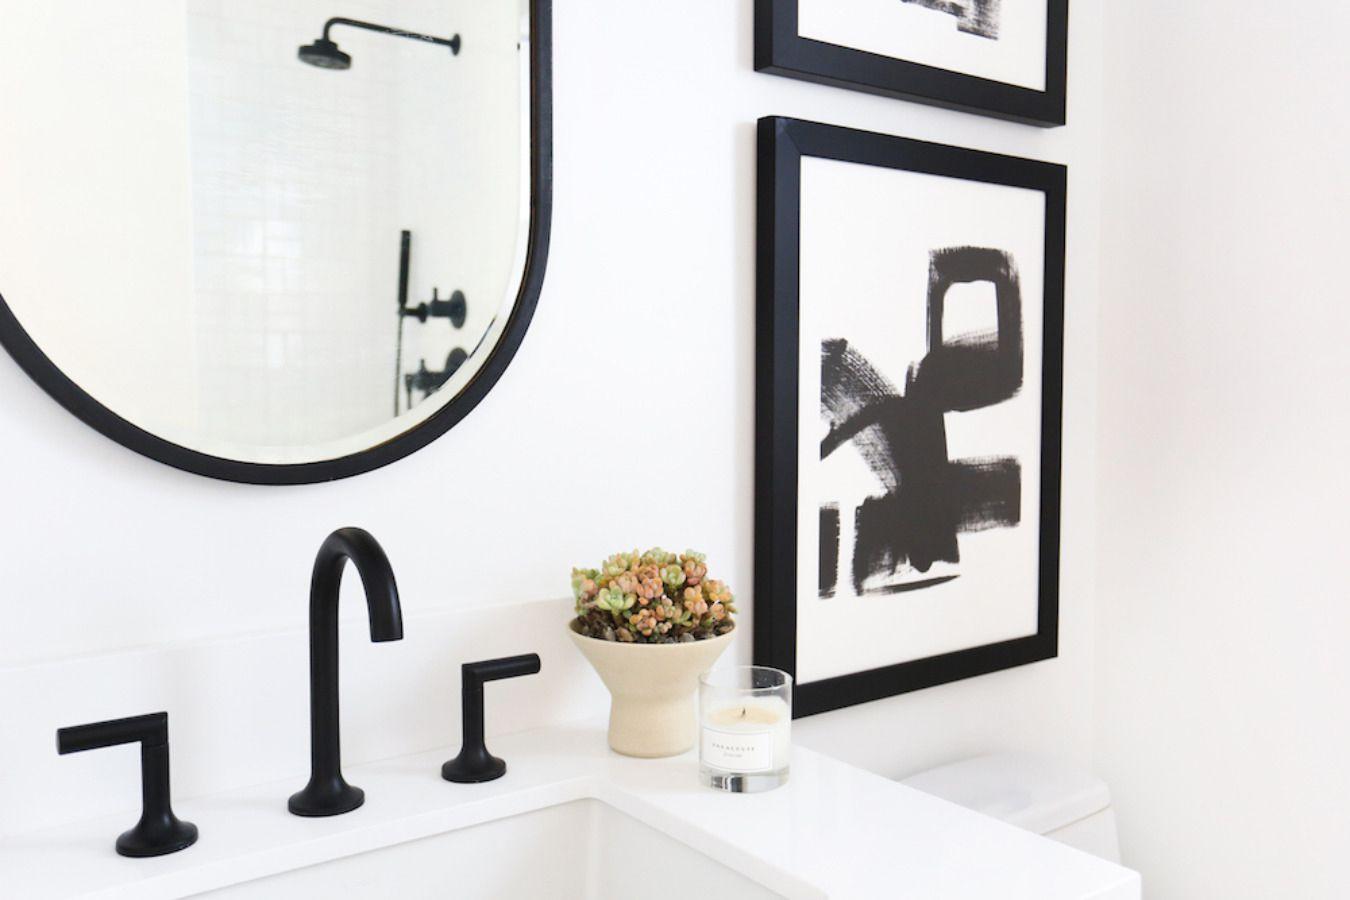 Black-Fixtures-and-Decorative-Accents-Small-Bathrooms